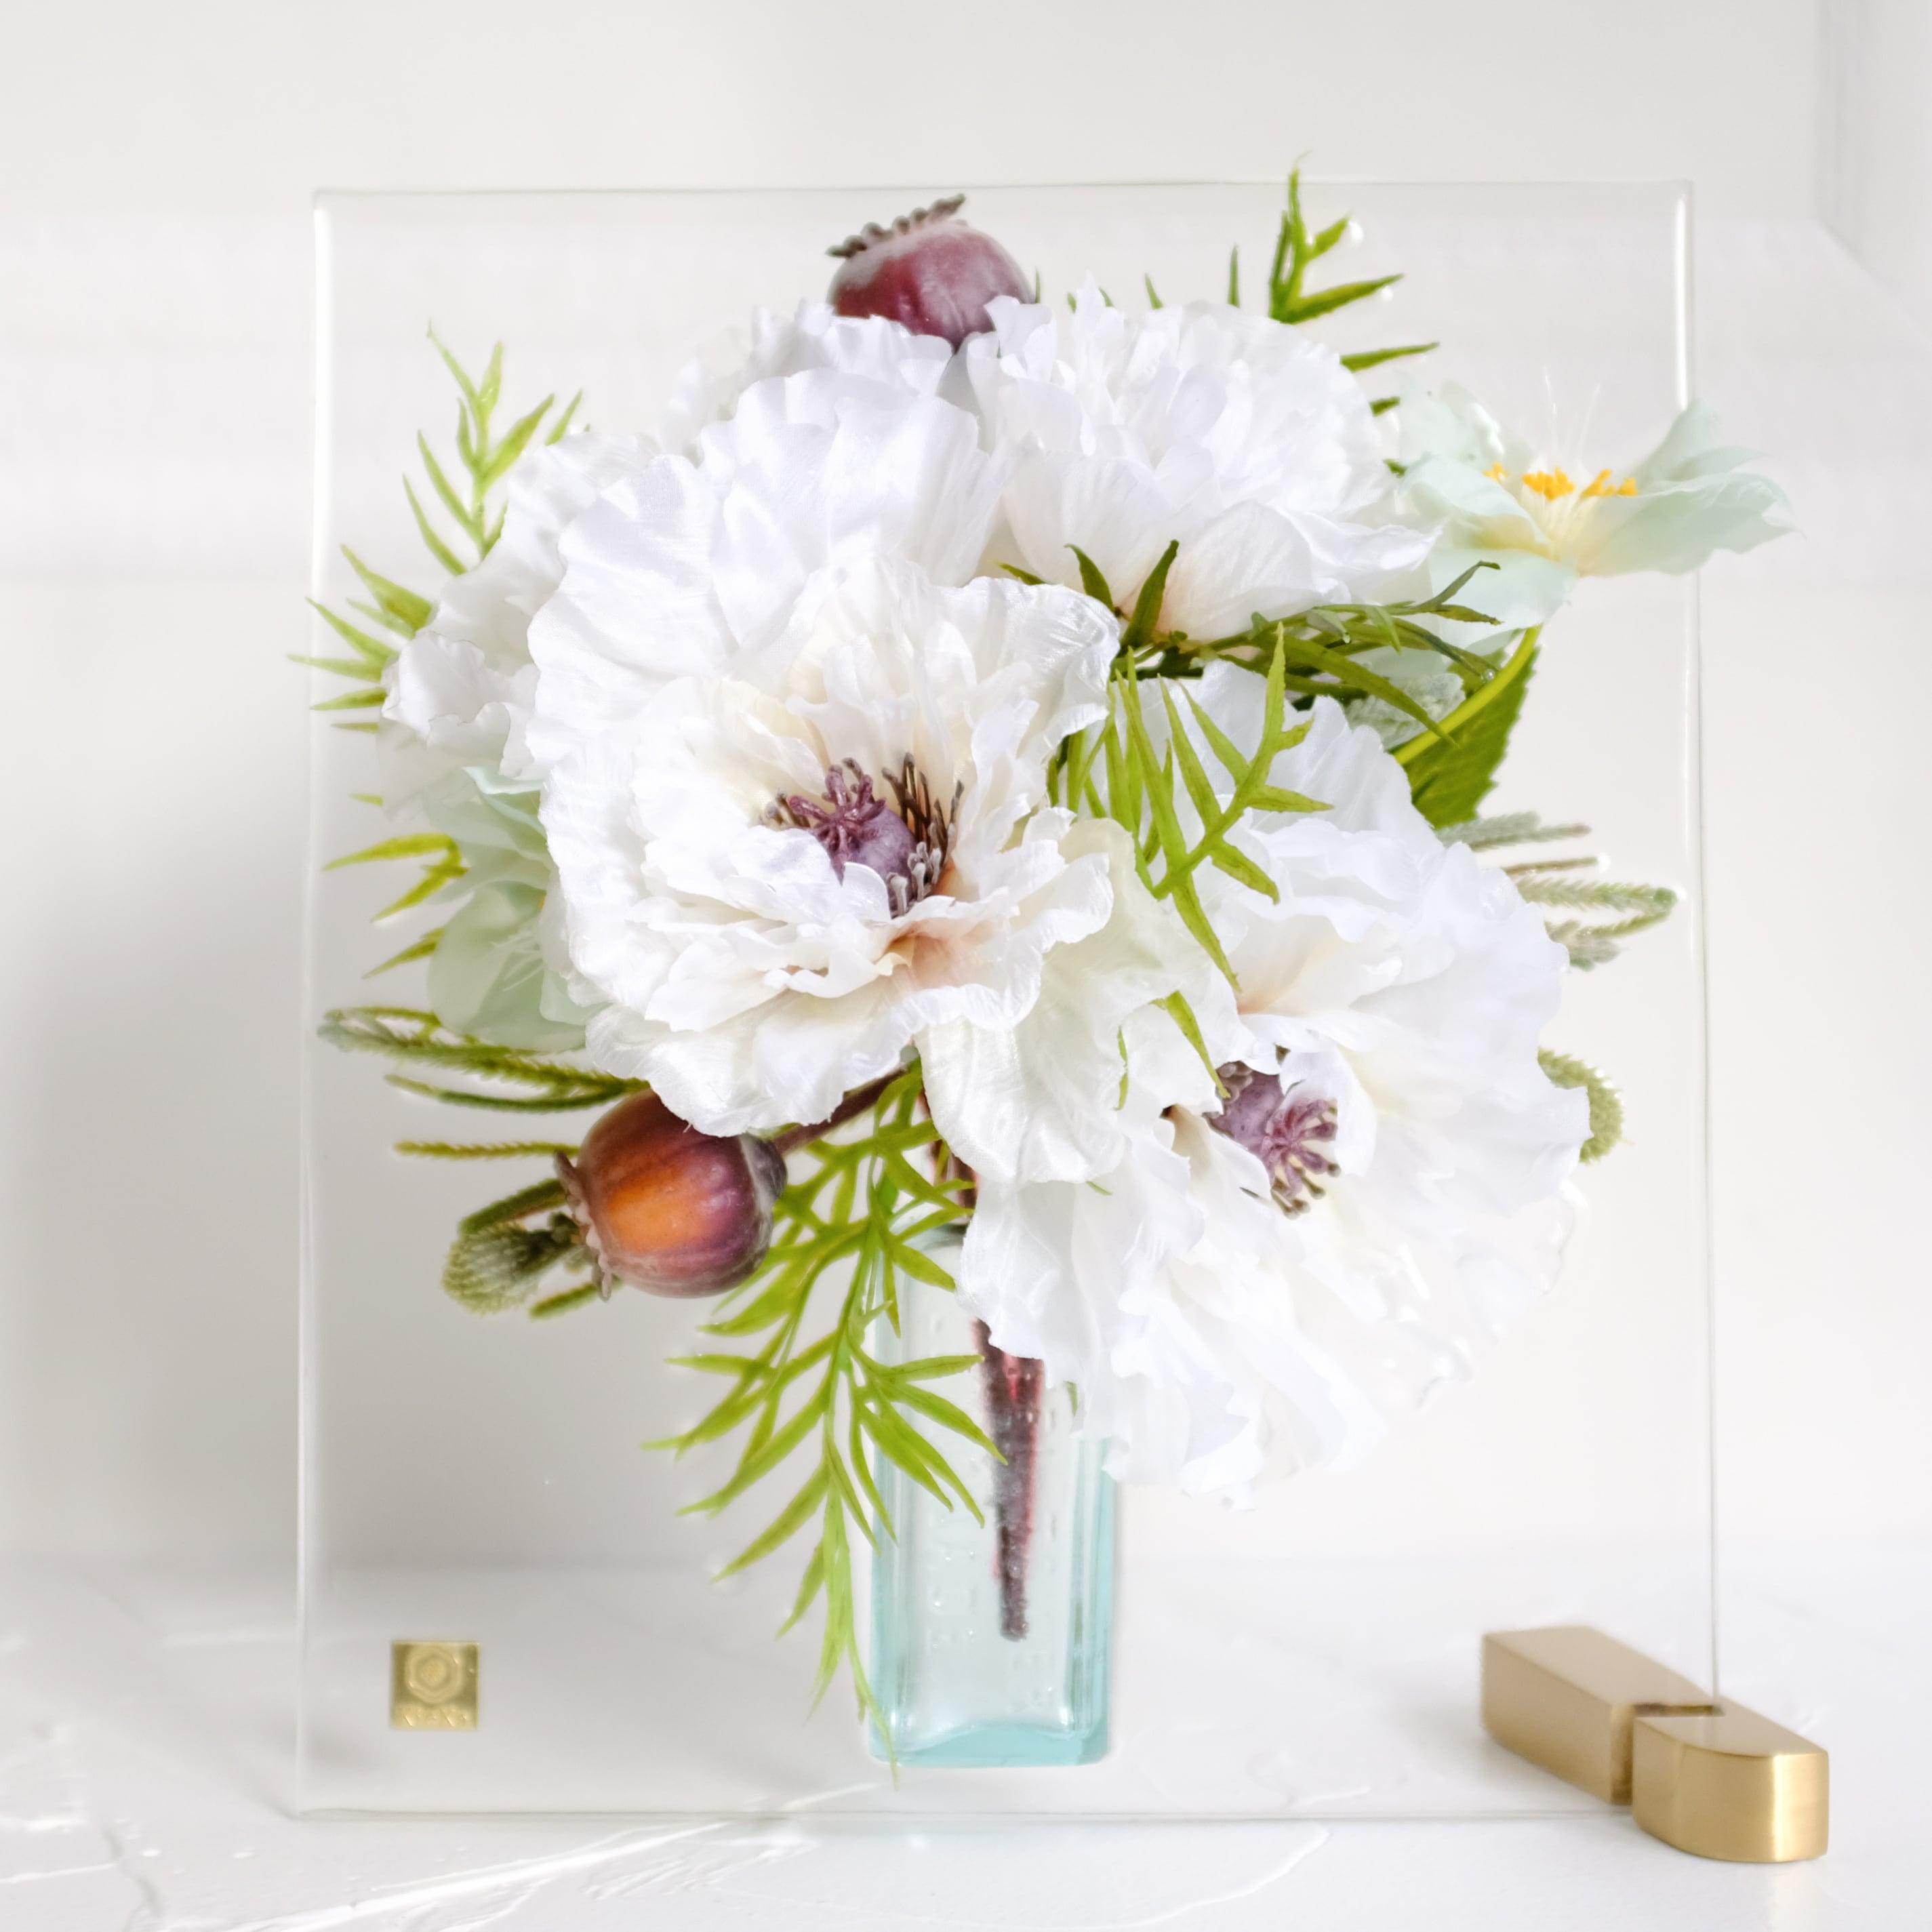 sumika M ポピー ホワイト アンティーク花瓶シリーズ